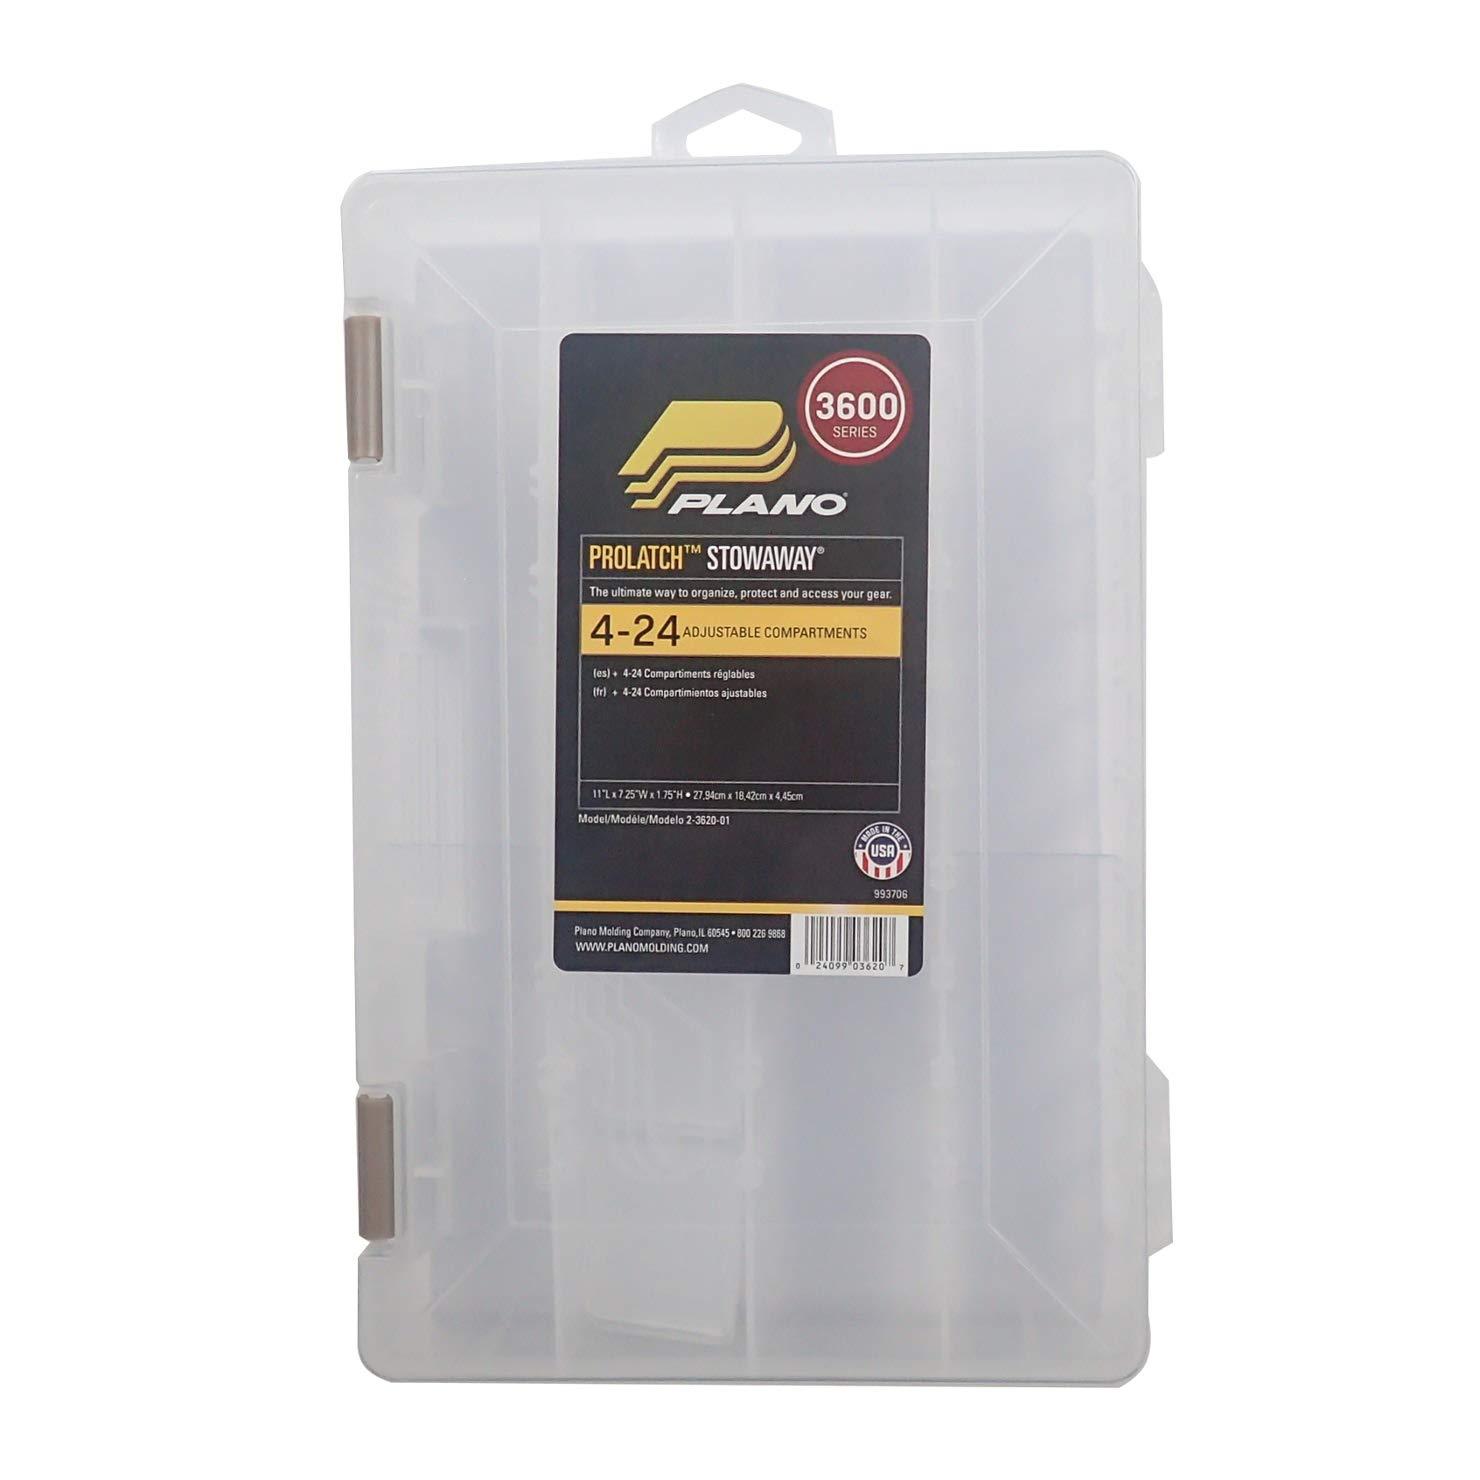 Plano ProLatch Utility Box #2-3620